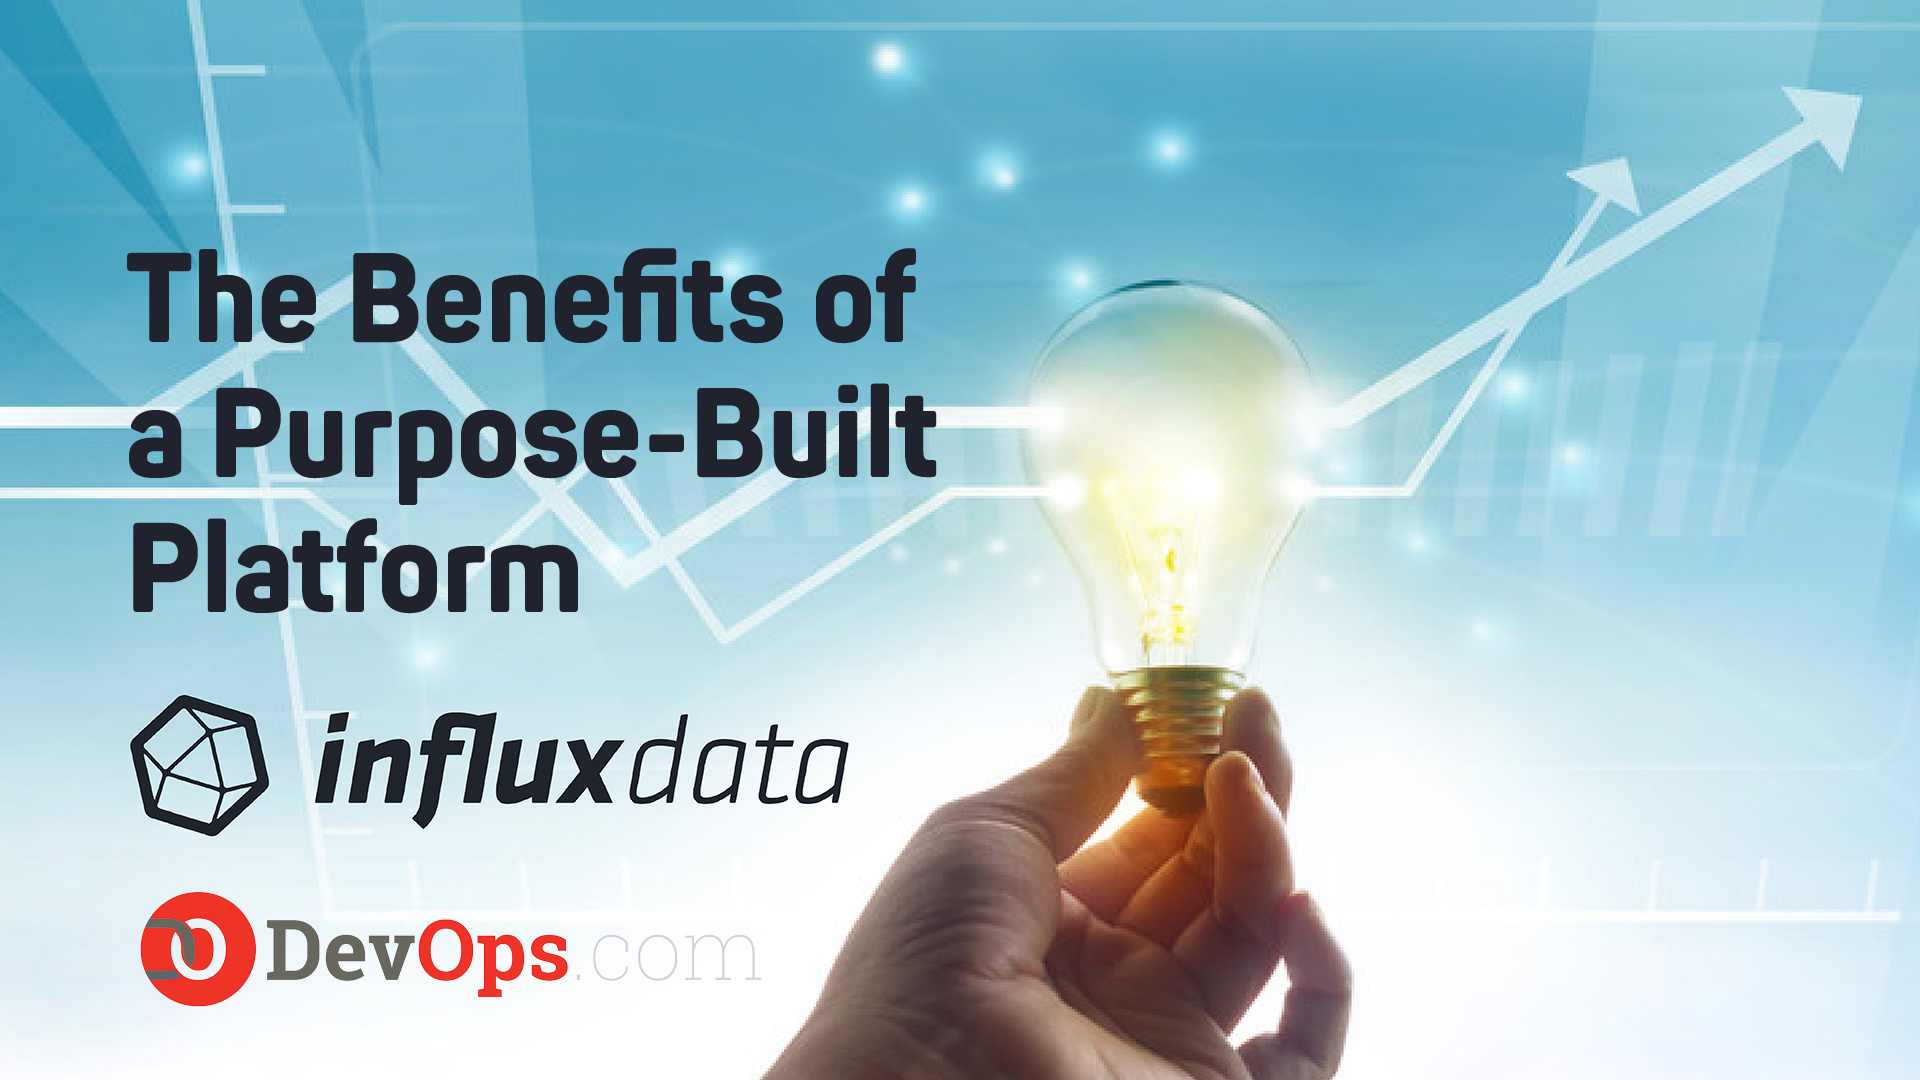 The Benefits of a Purpose-Built Platform